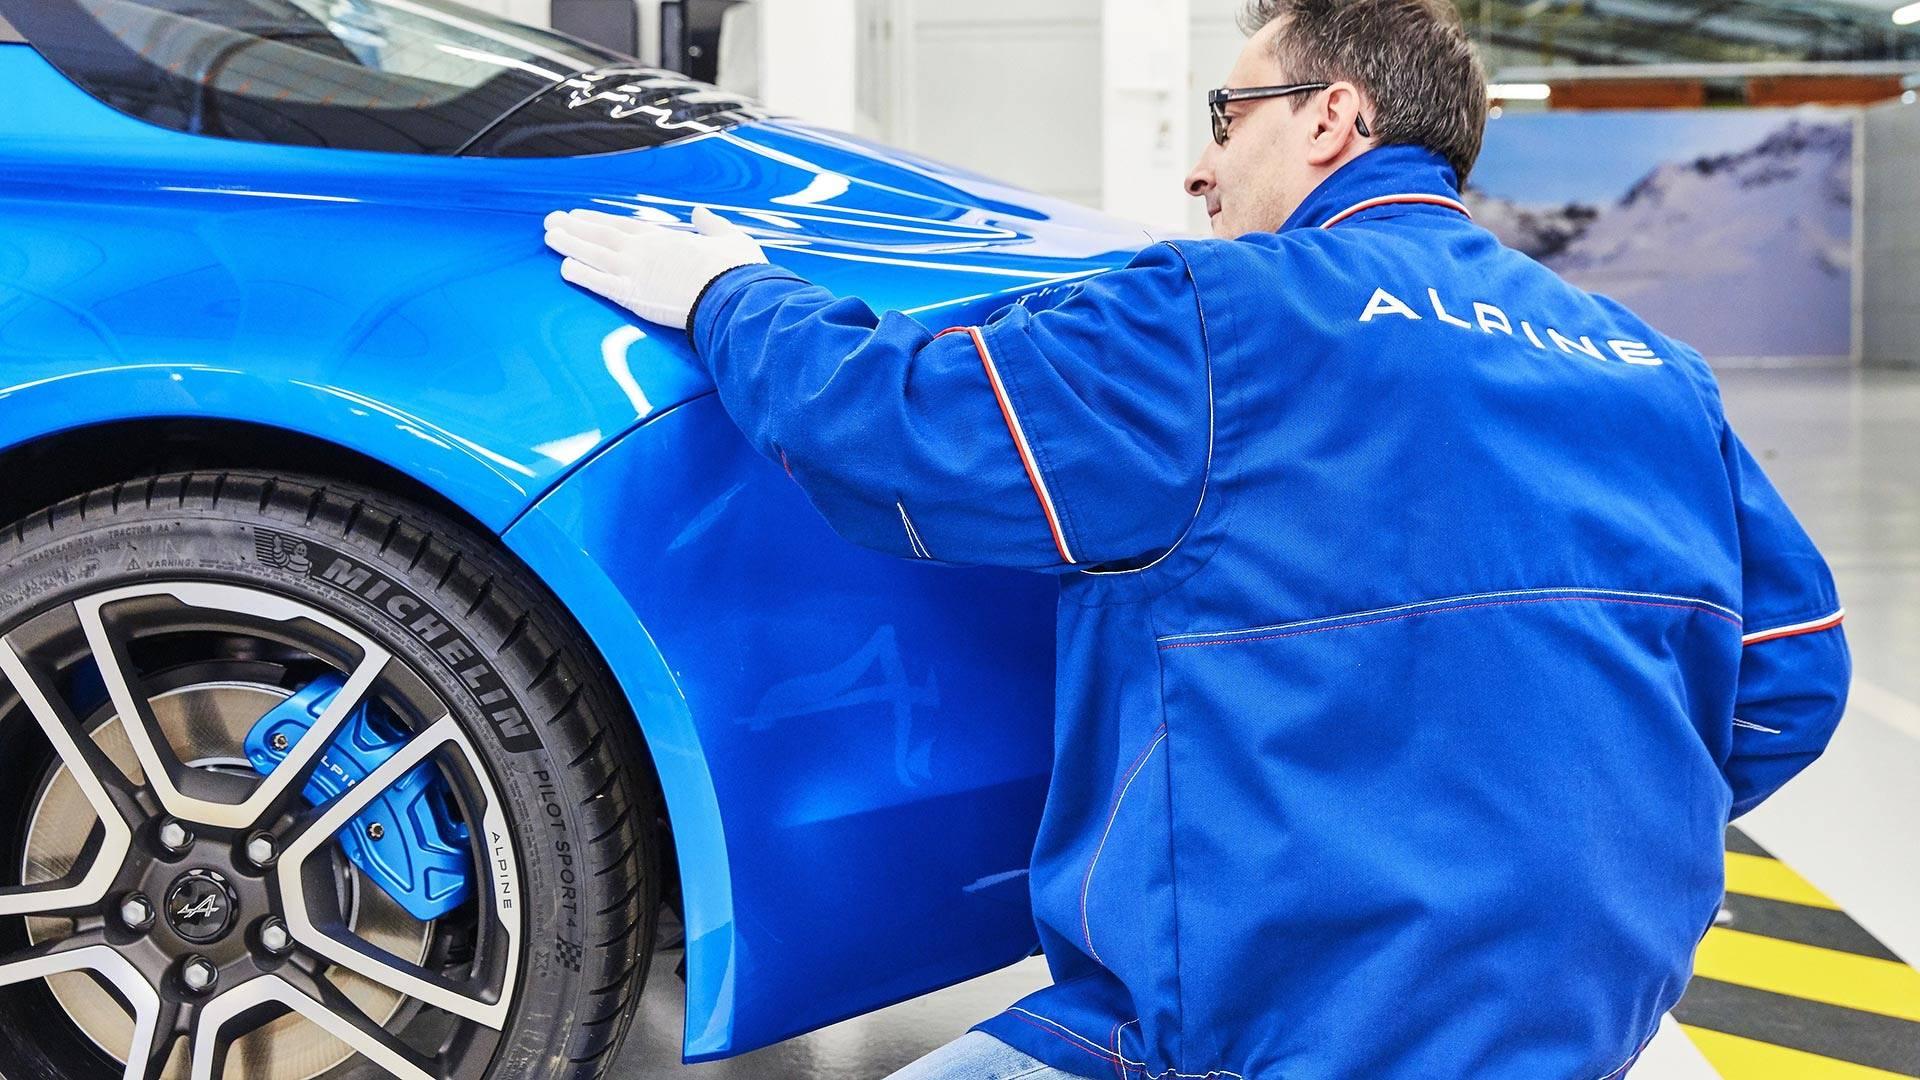 2017 - Fabrication de l'Alpine A110 à l'usine de Dieppe